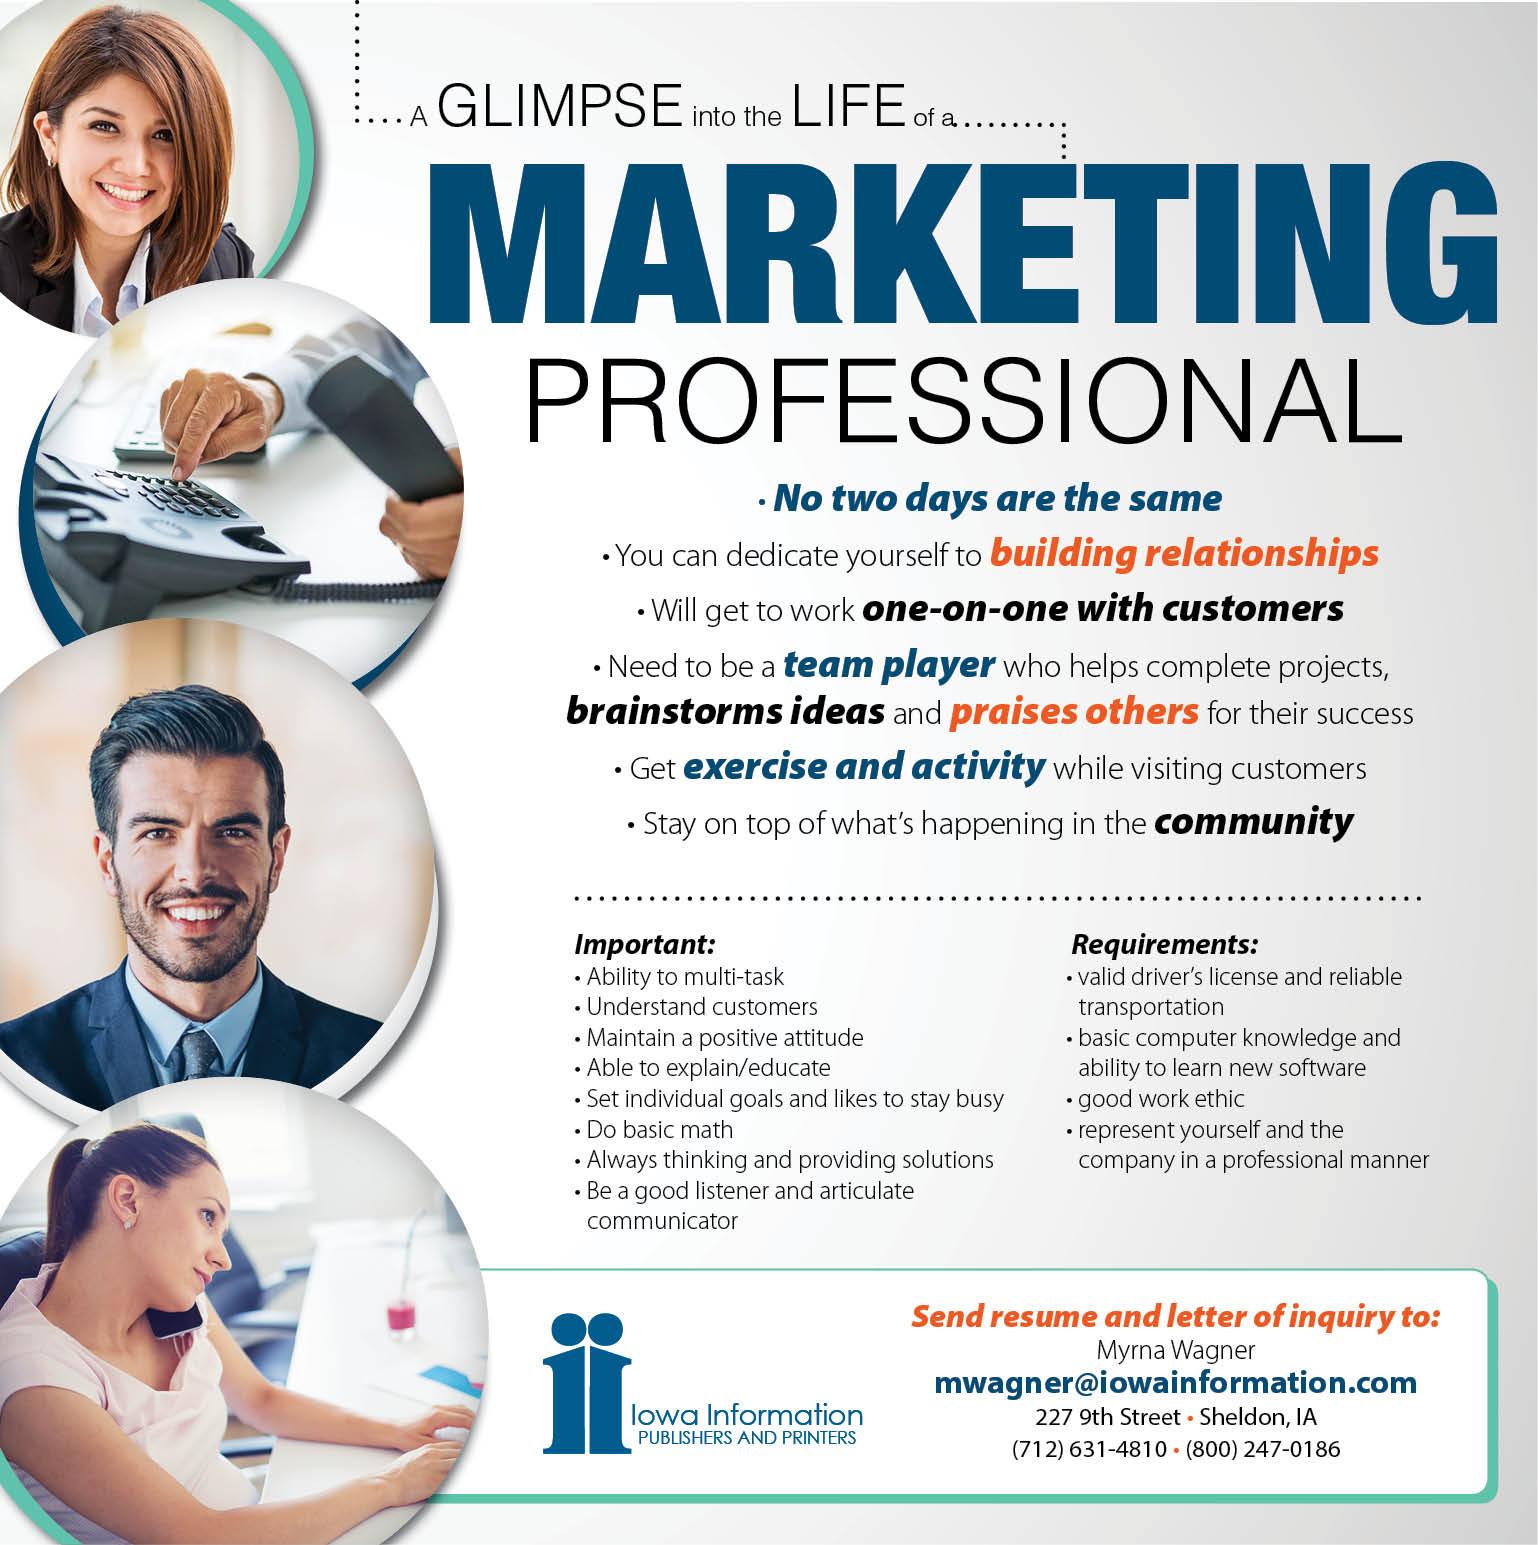 Marketing Professional at Iowa Information